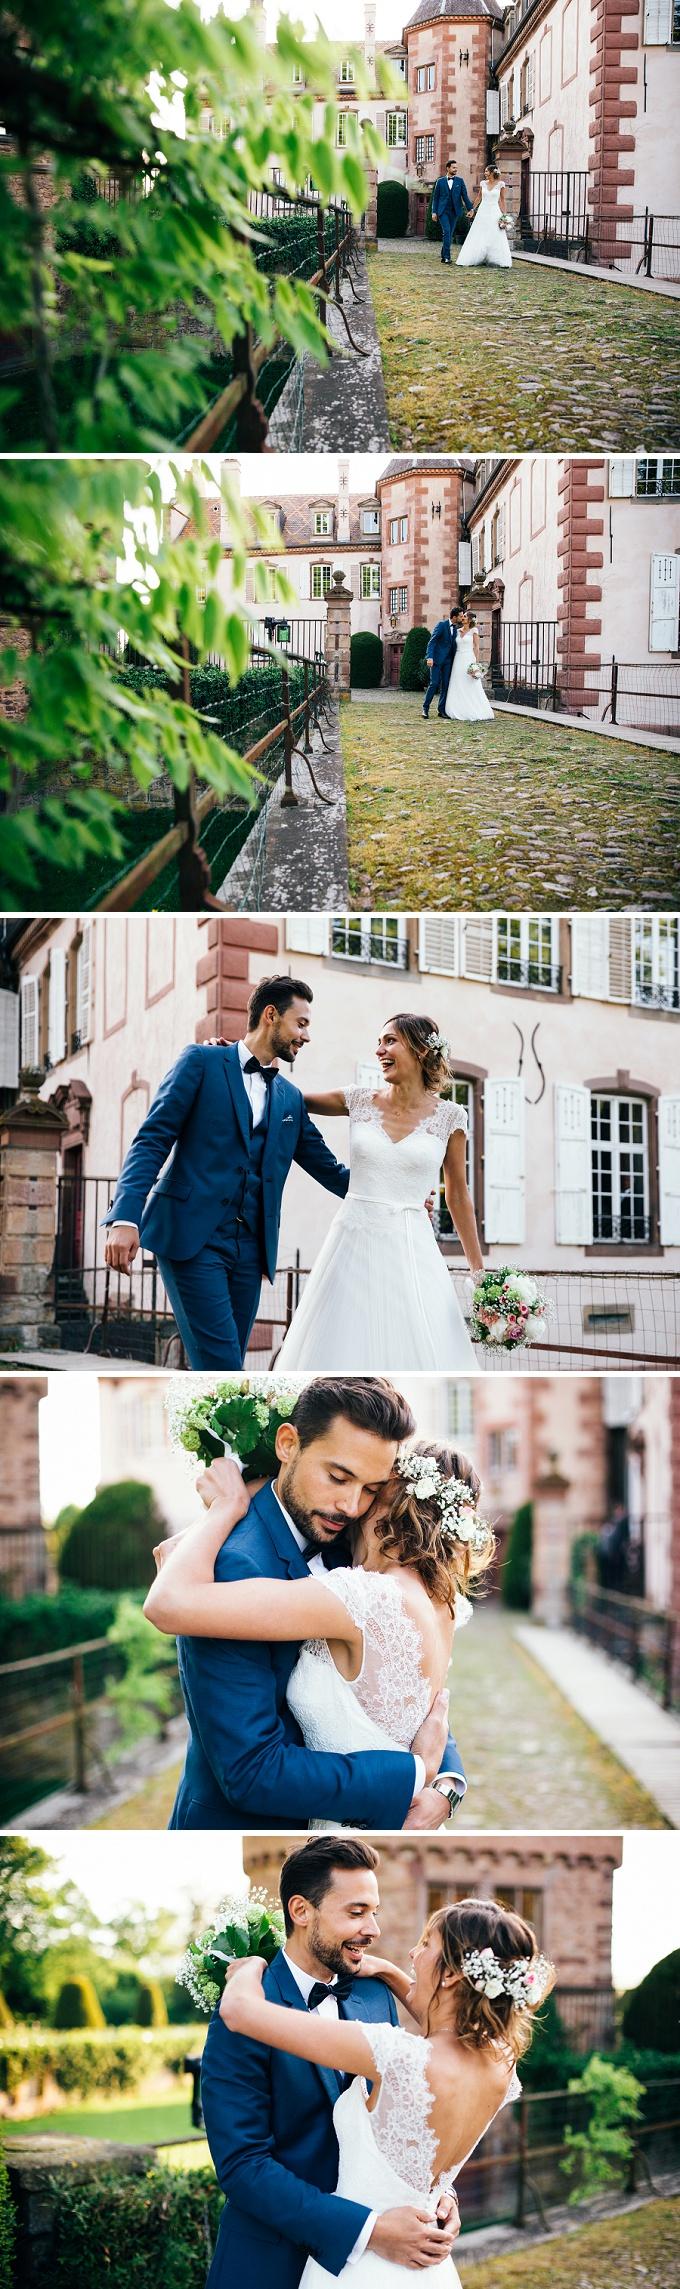 mariage-chateau-dosthoffen-025.jpg